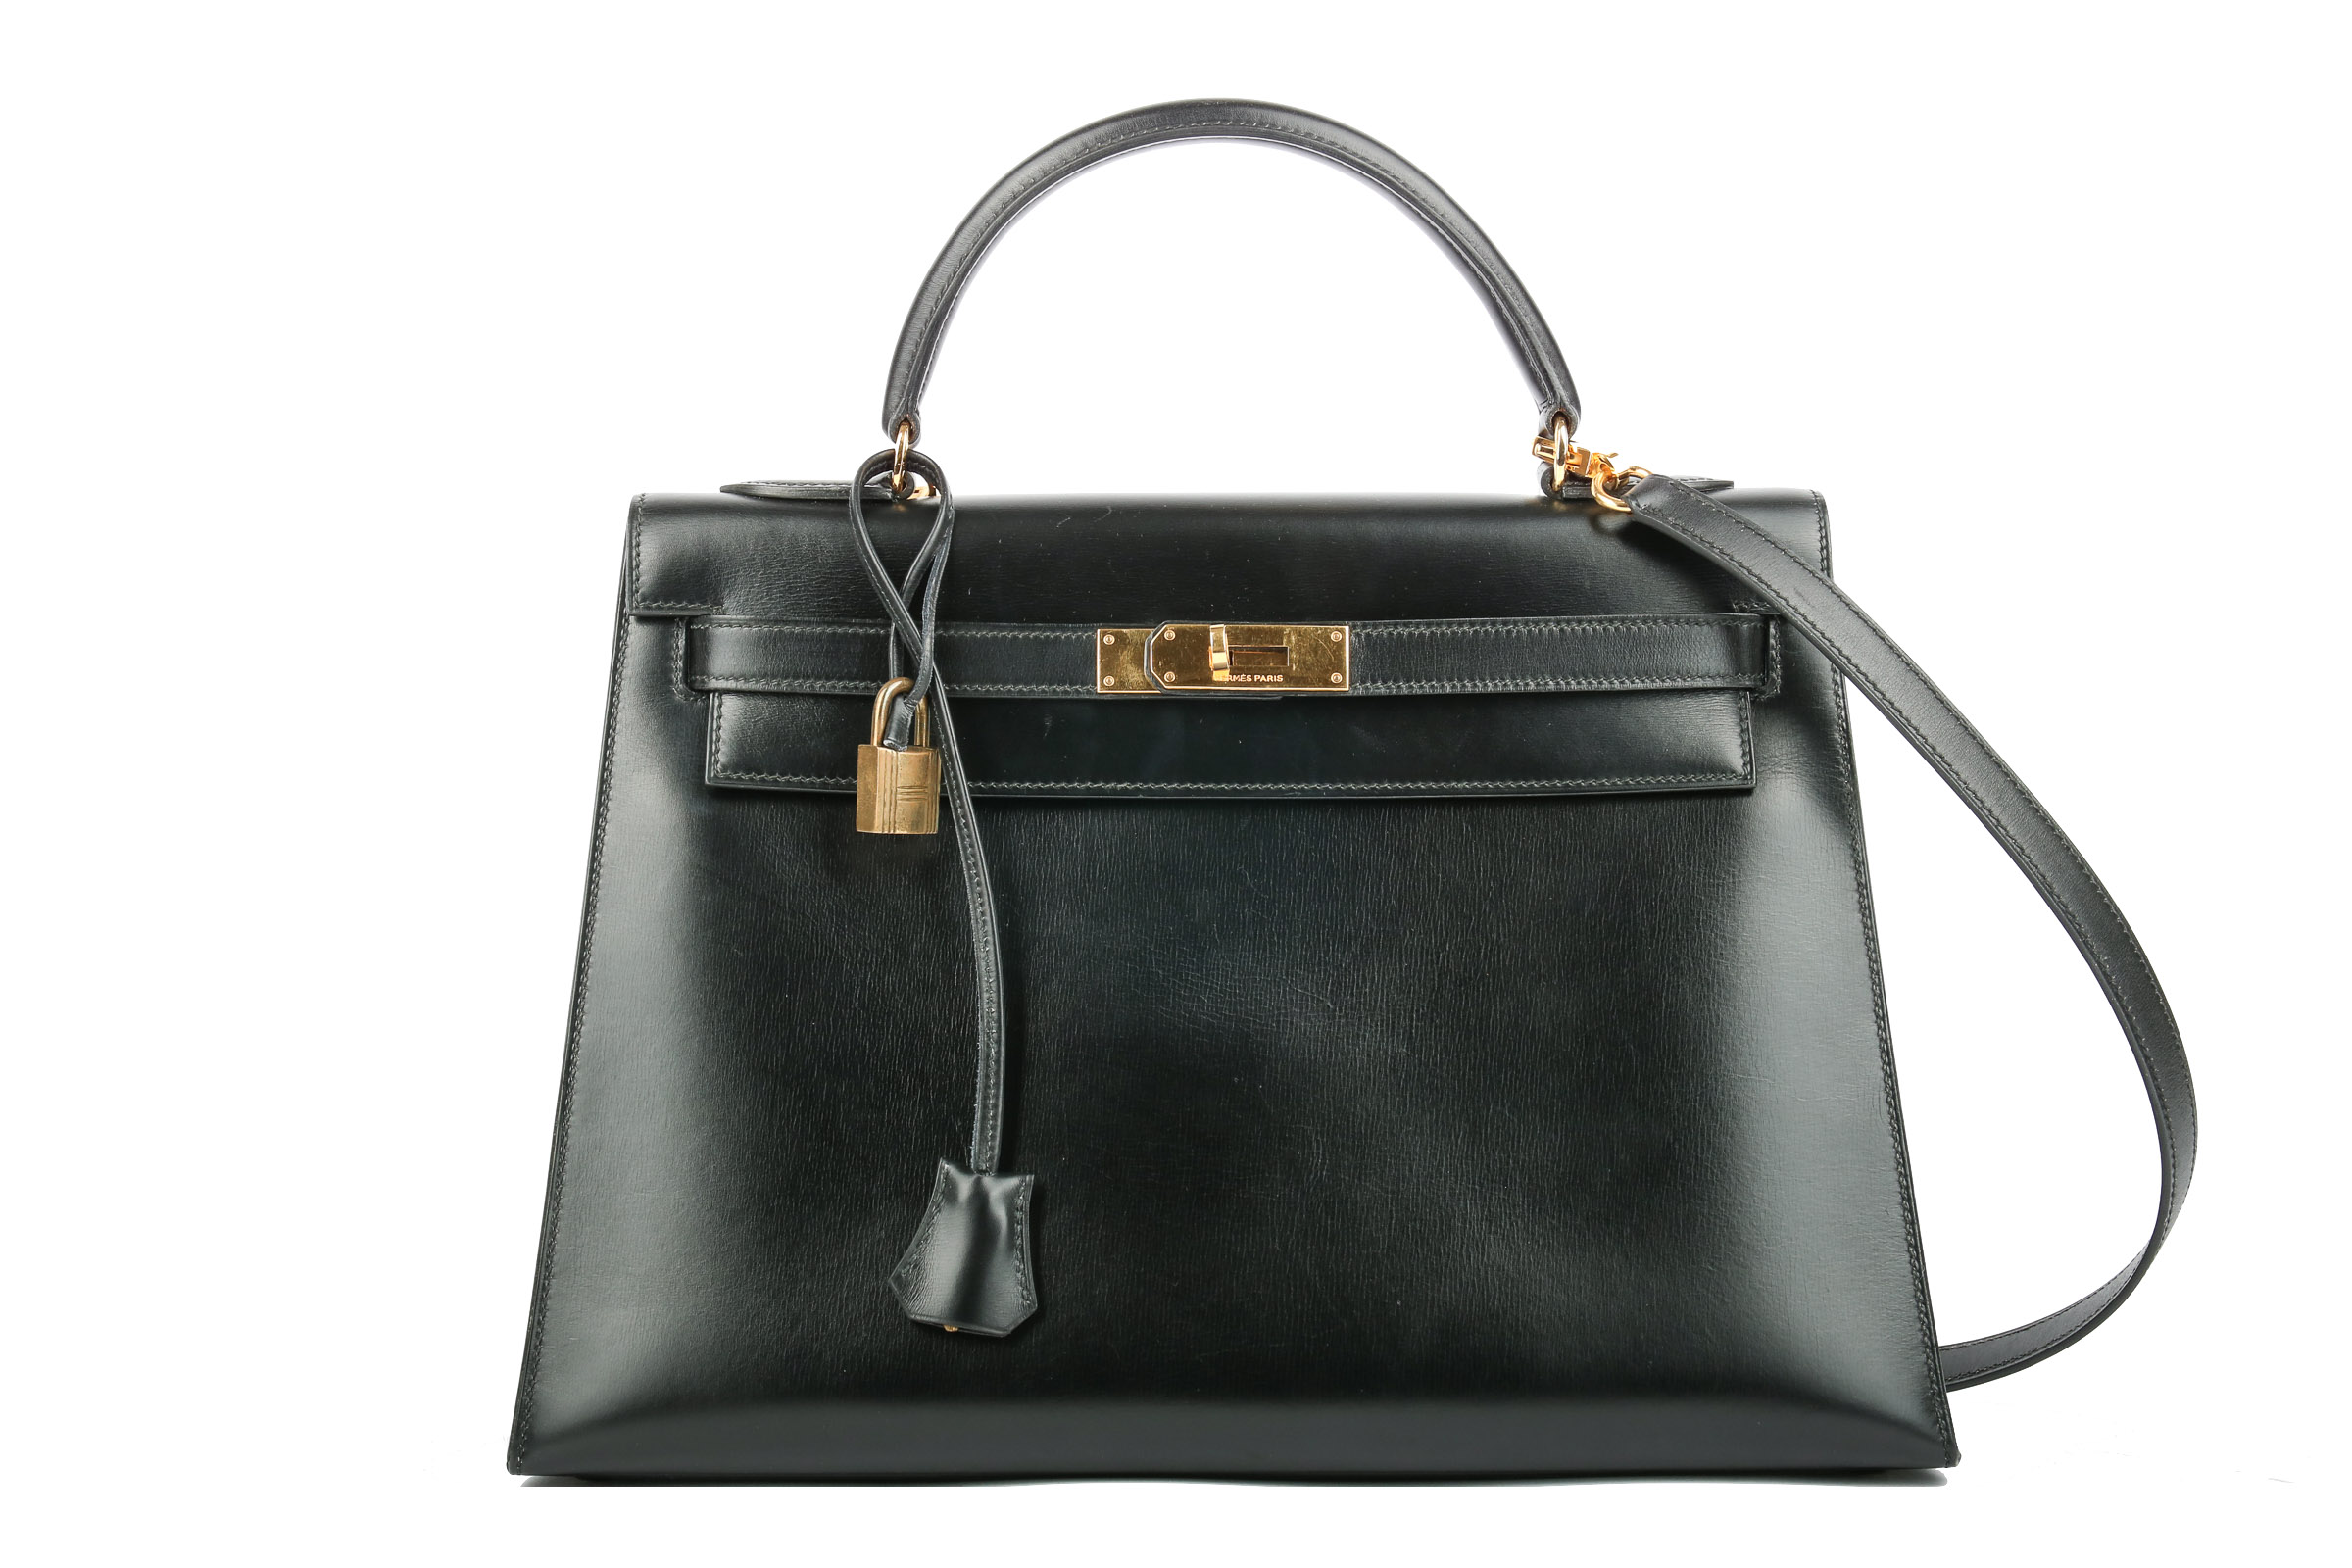 ba2bc5c4b0eb9 Preview  Hermès Kelly Bag 32 Sellier Noir Boxleder Bijou Ore. Preview   Hermès Kelly Bag 32 Sellier Noir Boxleder Bijou Ore